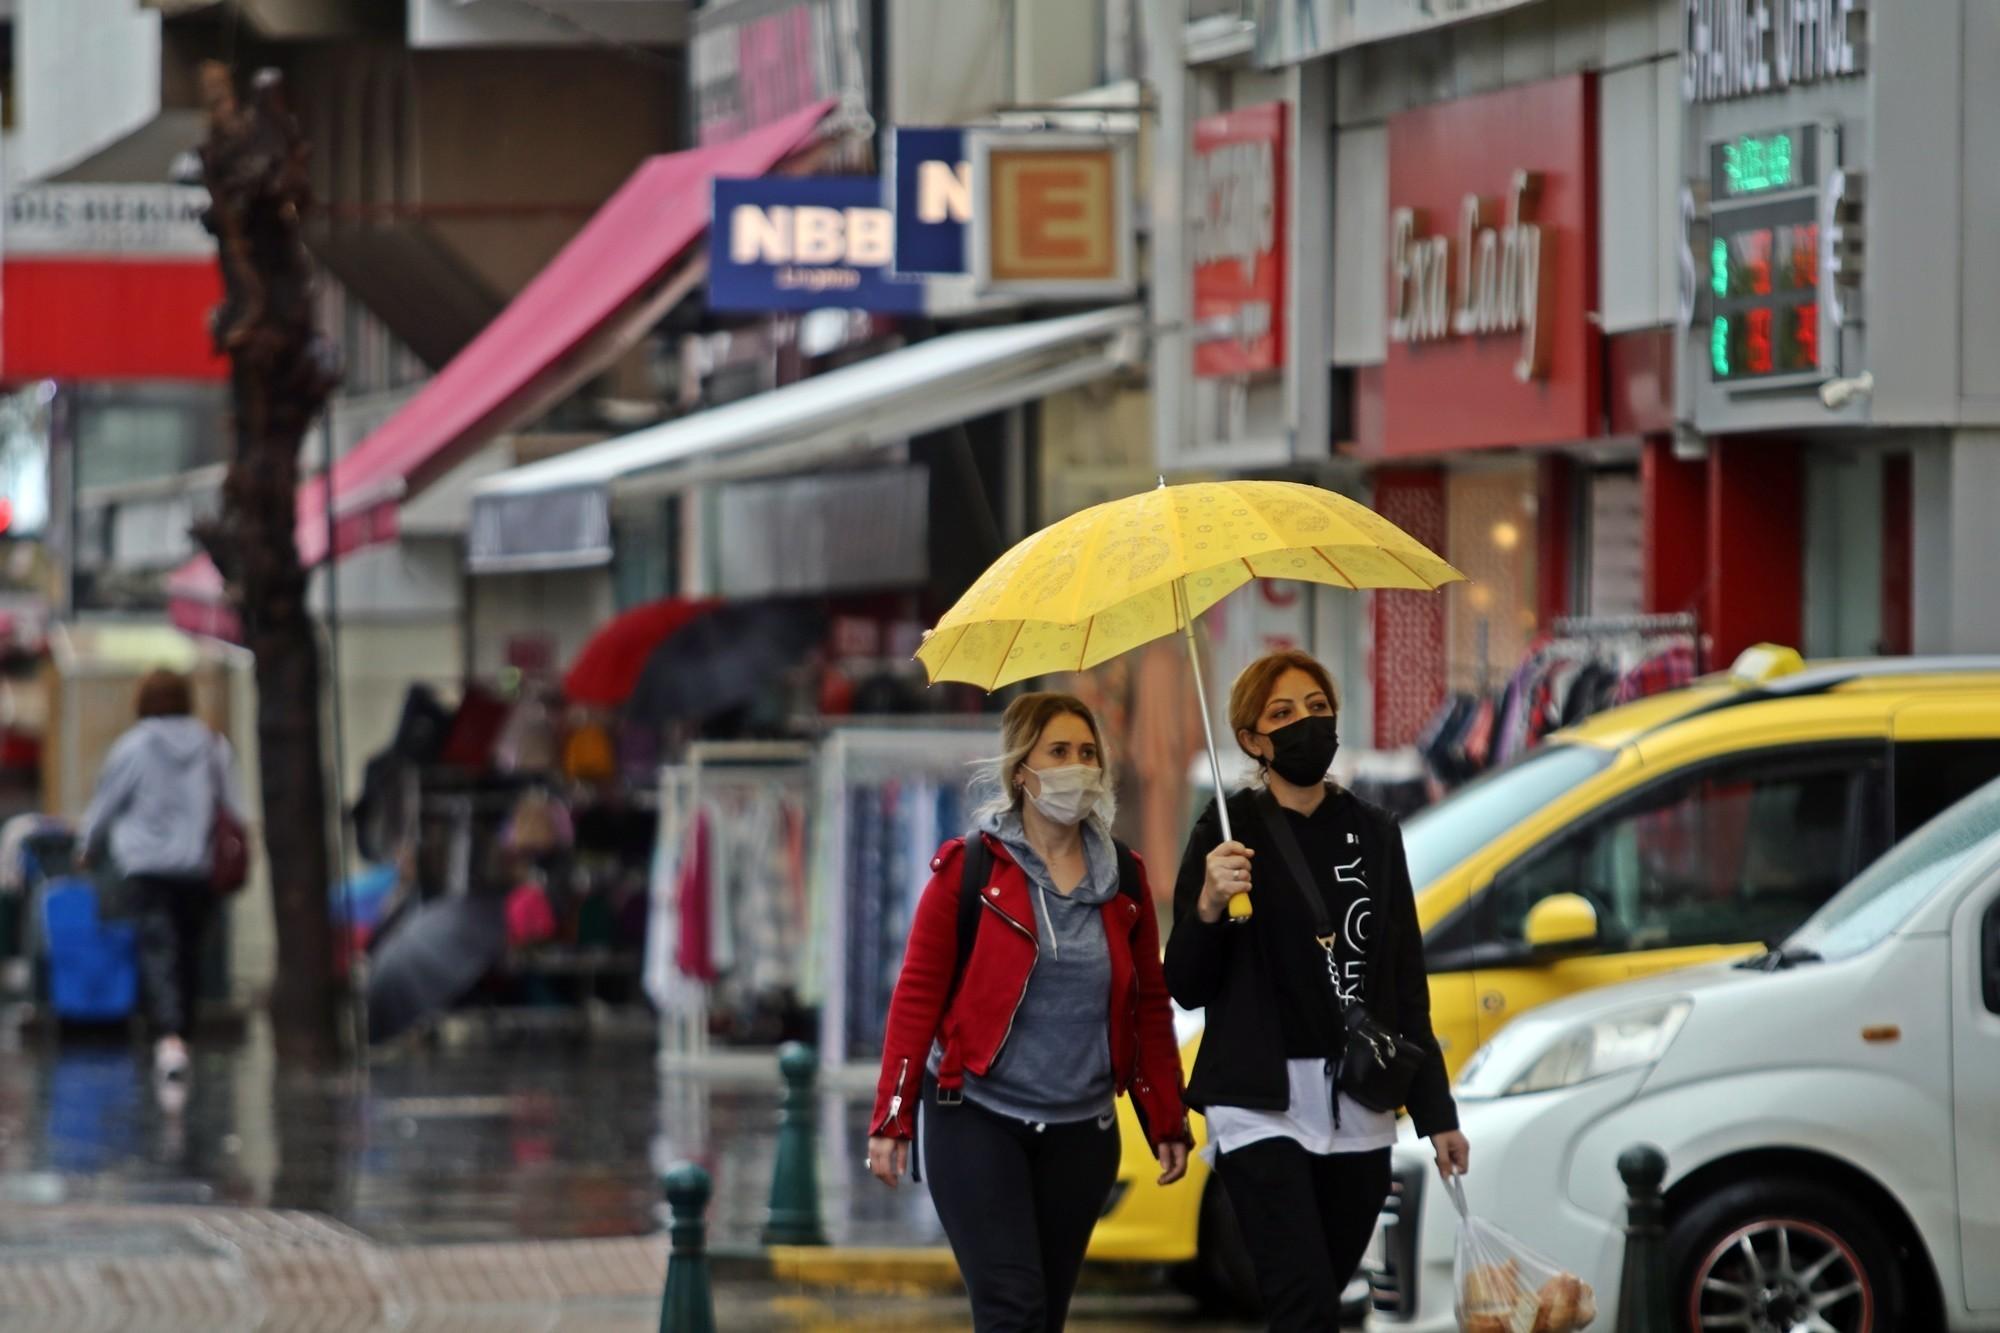 Antalya'ya kuvvetli sağanak yağış uyarısı! Valilik 9 ilçeye işaret etti...